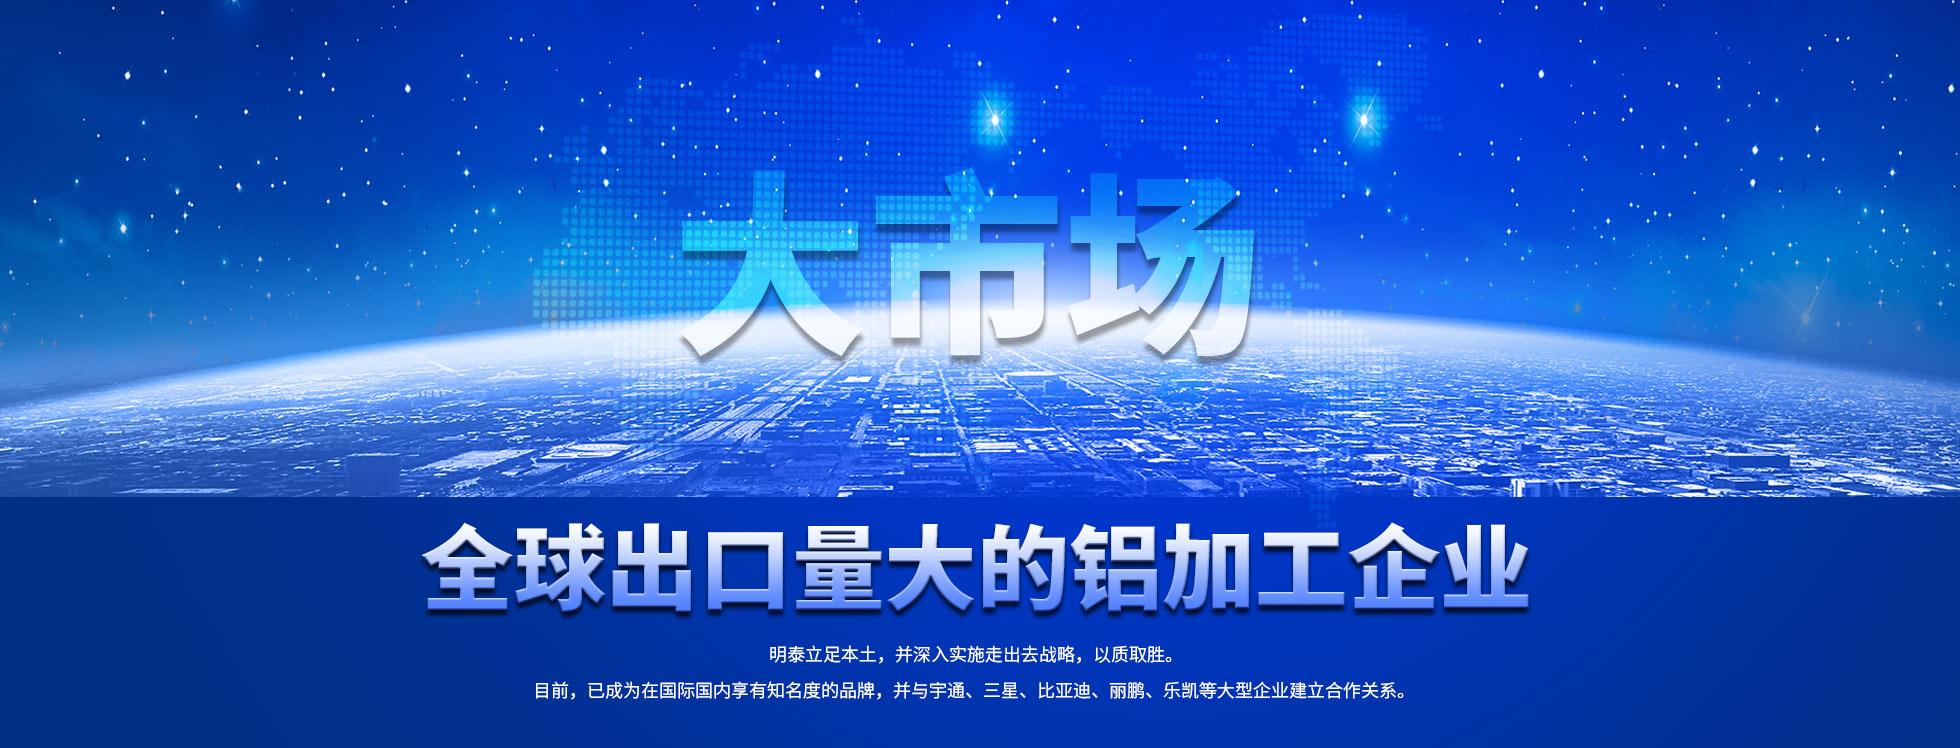 鋁板帶(dai)箔年(nian)產(chan)能650000噸